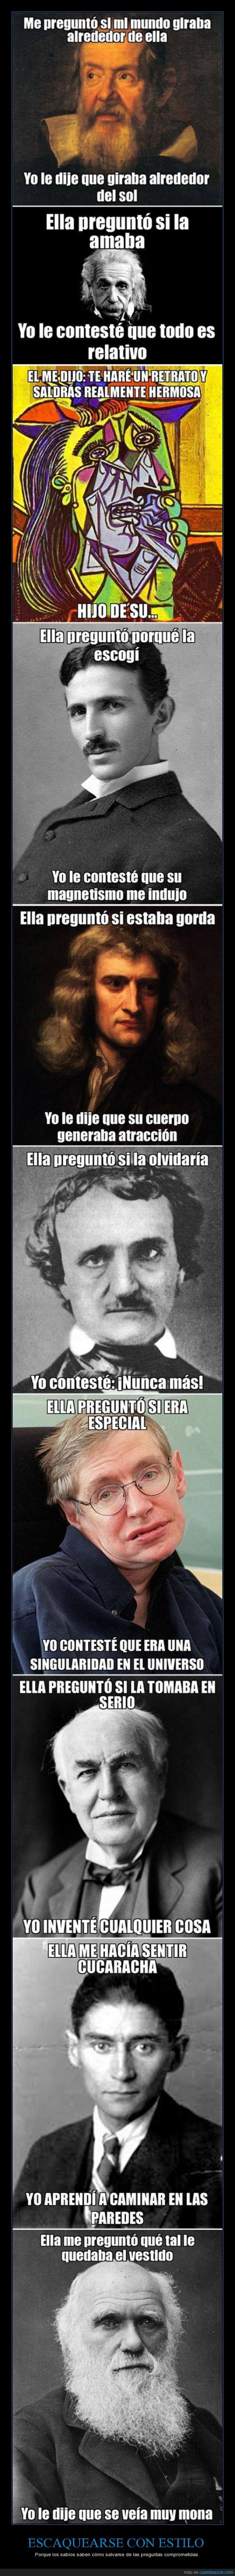 Copernico,Darwin,Edgar Allan Poe,Edison,Einstein,frases,genios,Kafka,Newton,Picasso,Stephen Hawking,Tesla